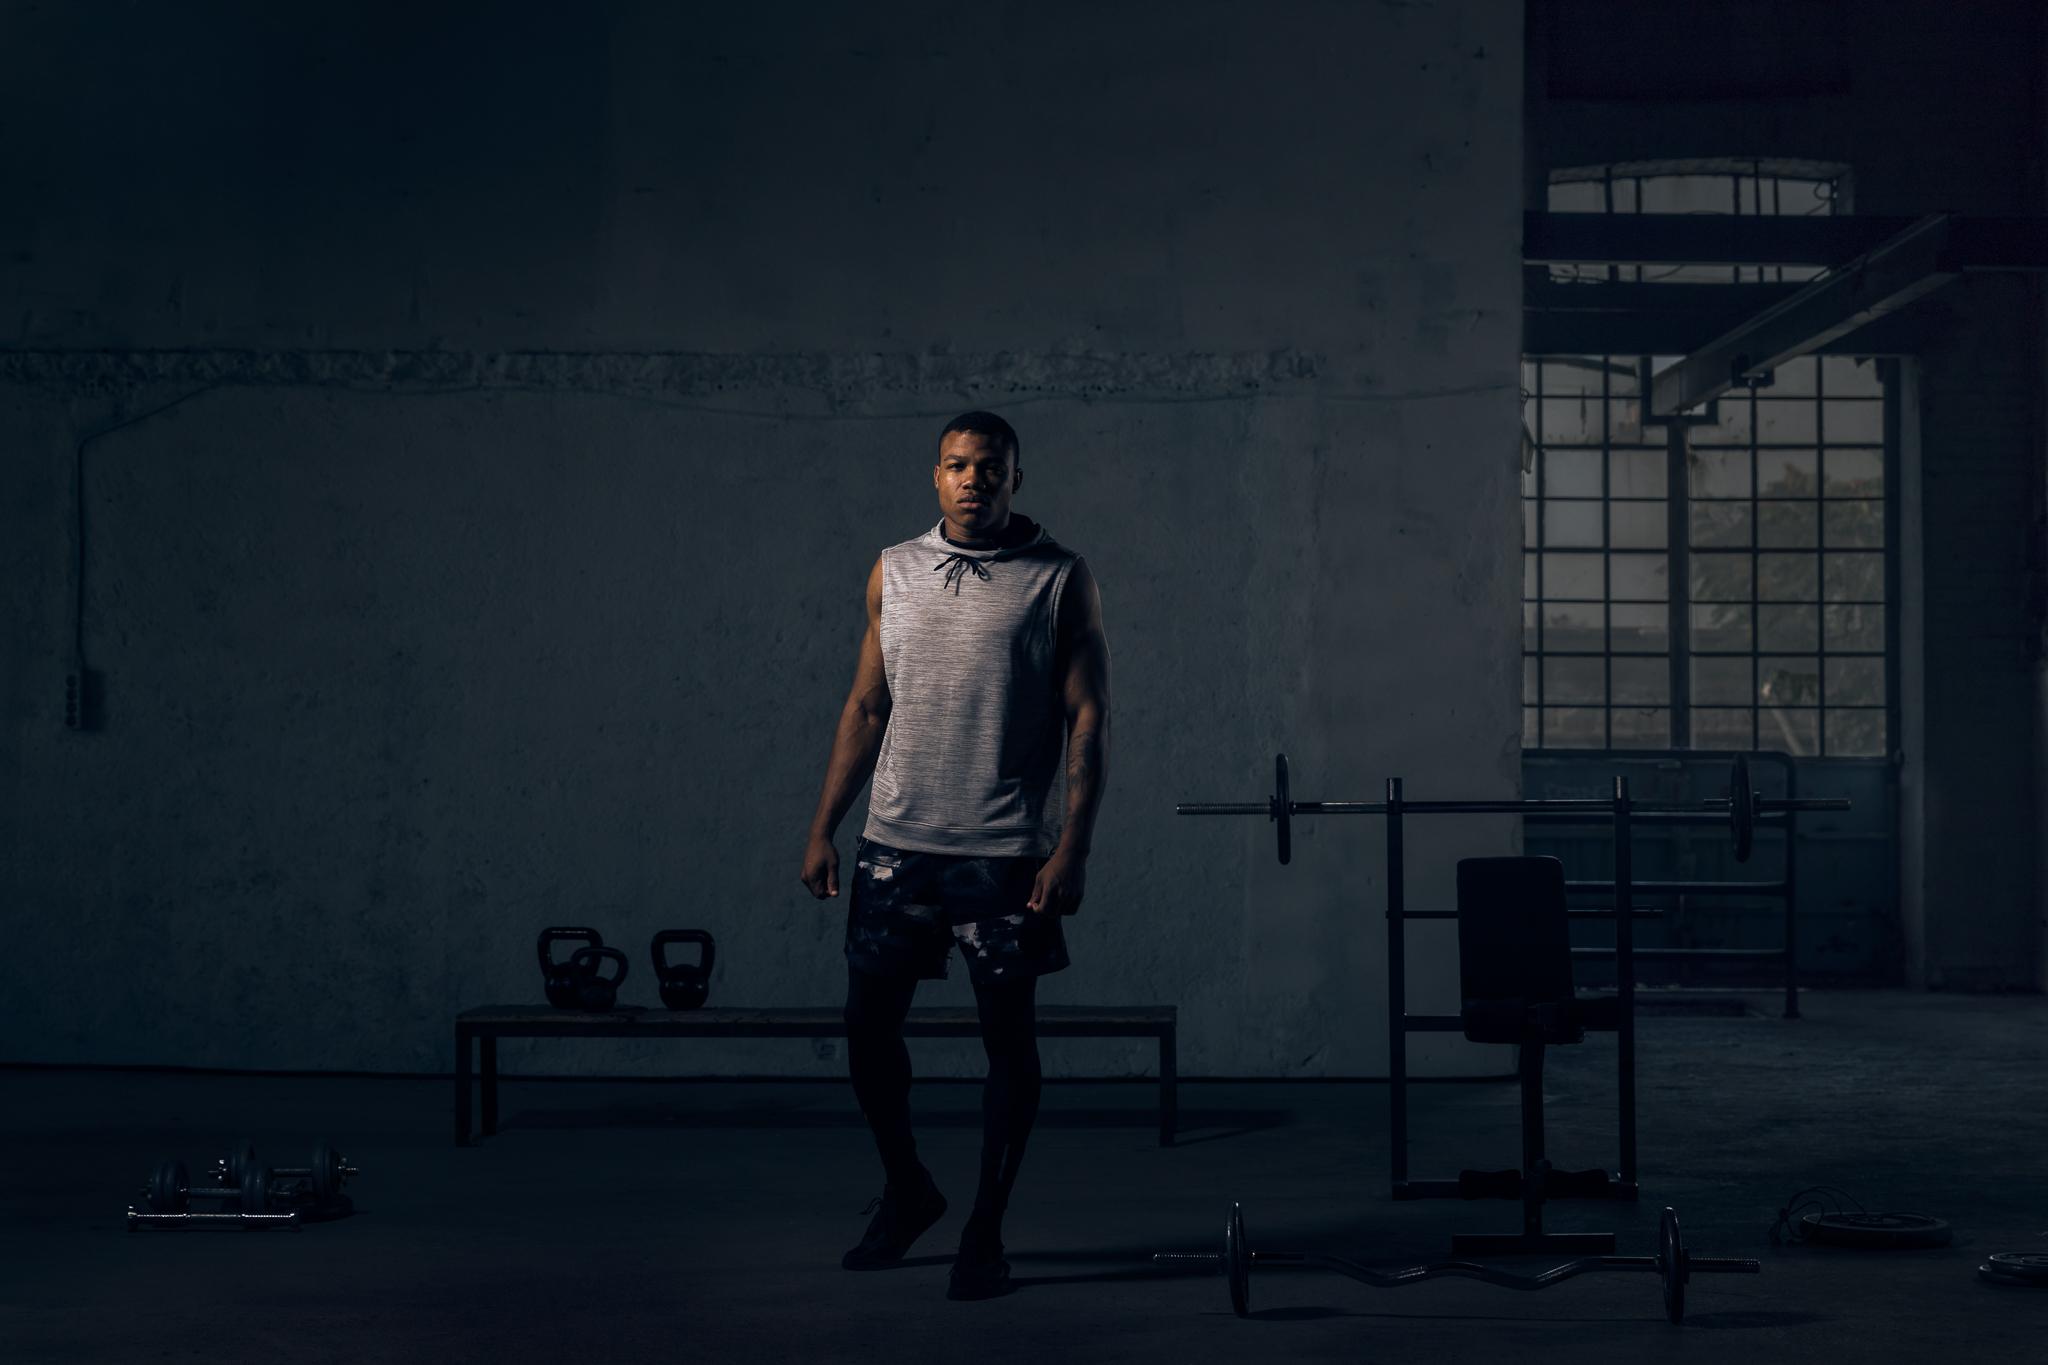 kostis sohoritis photography advertising ogilvy one cosmote 4G squat 12.jpg